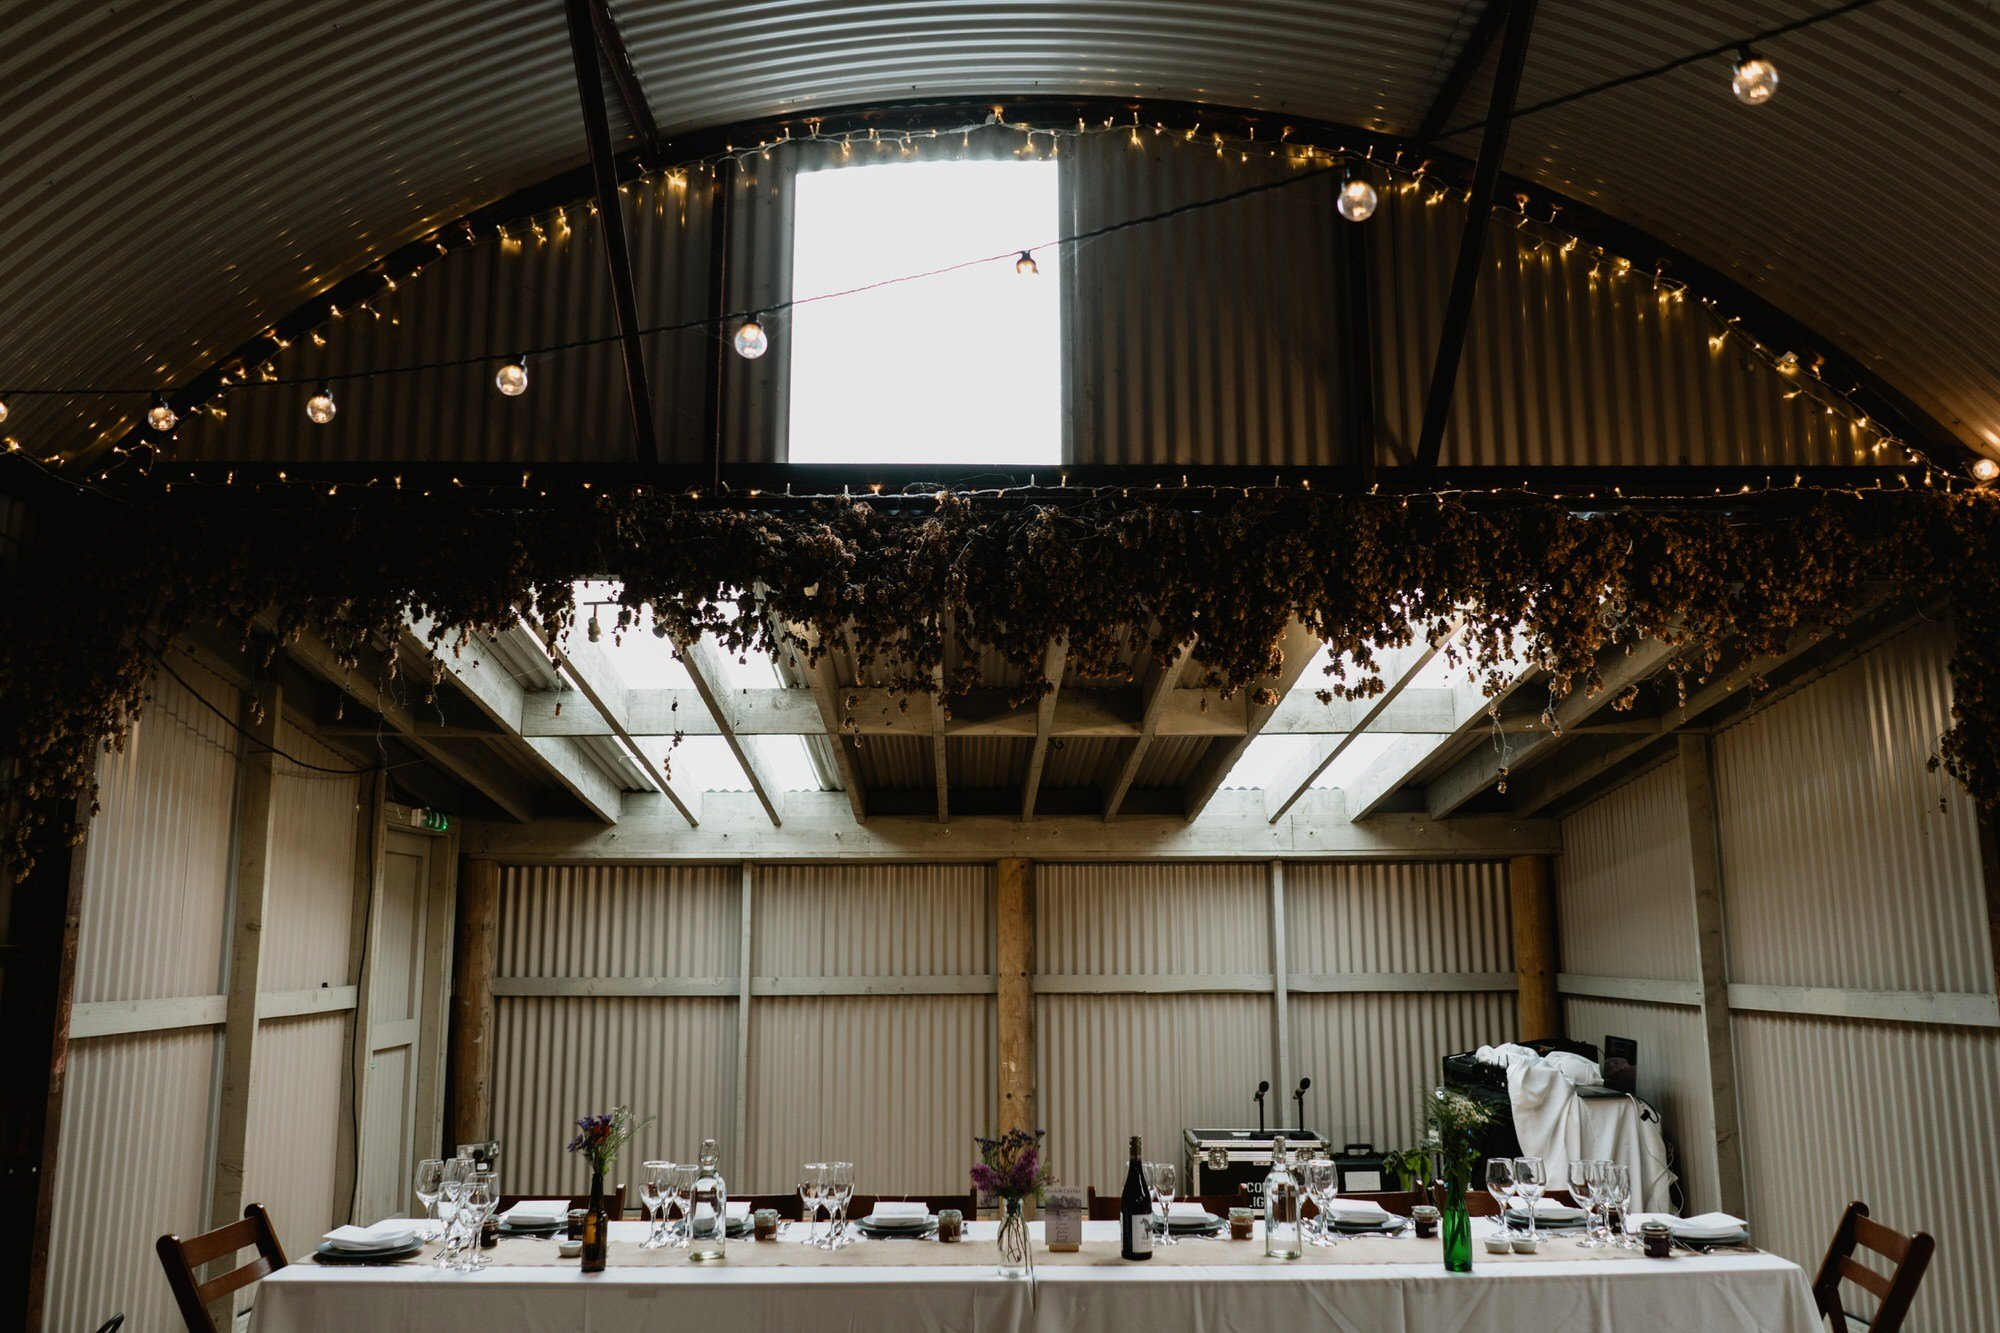 032 TIN SHED TOP TABLE SET UP KNOCKRAICH WEDDING AUSTRIAN SCOTTISH ZOE ALEXANDRA PHOTOGRAPHY